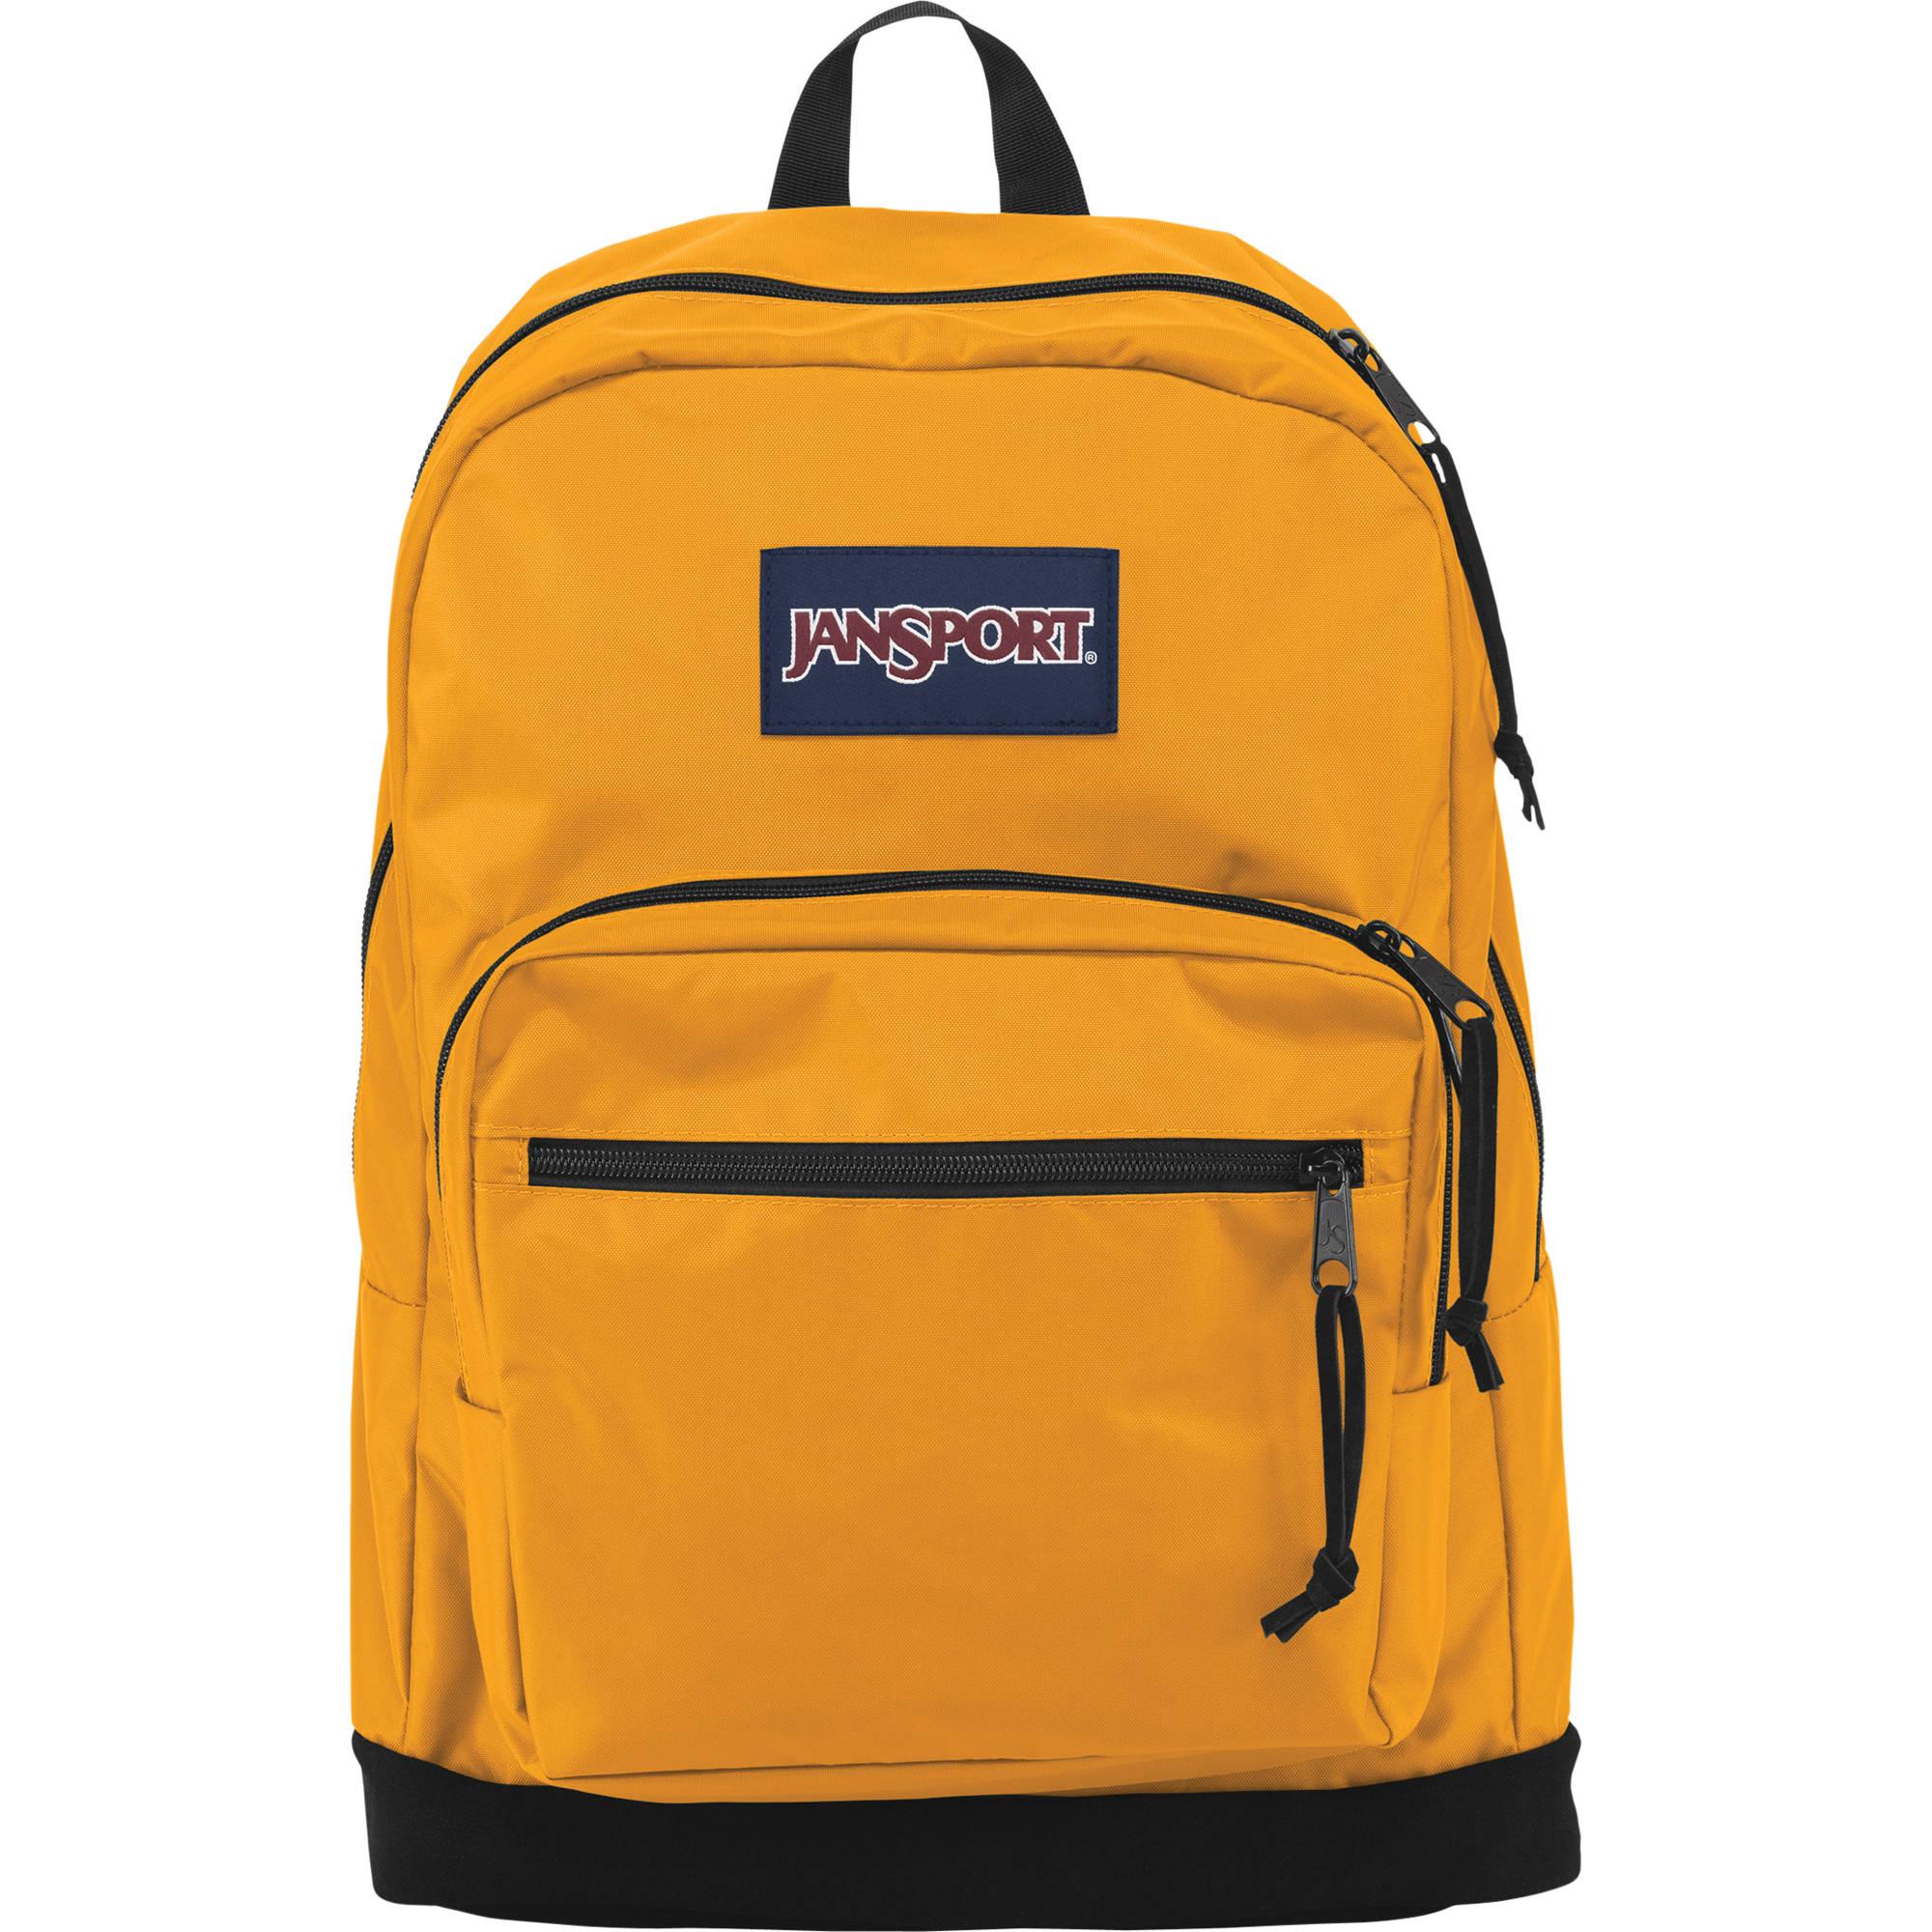 Jansport Backpack Yellow – TrendBackpack